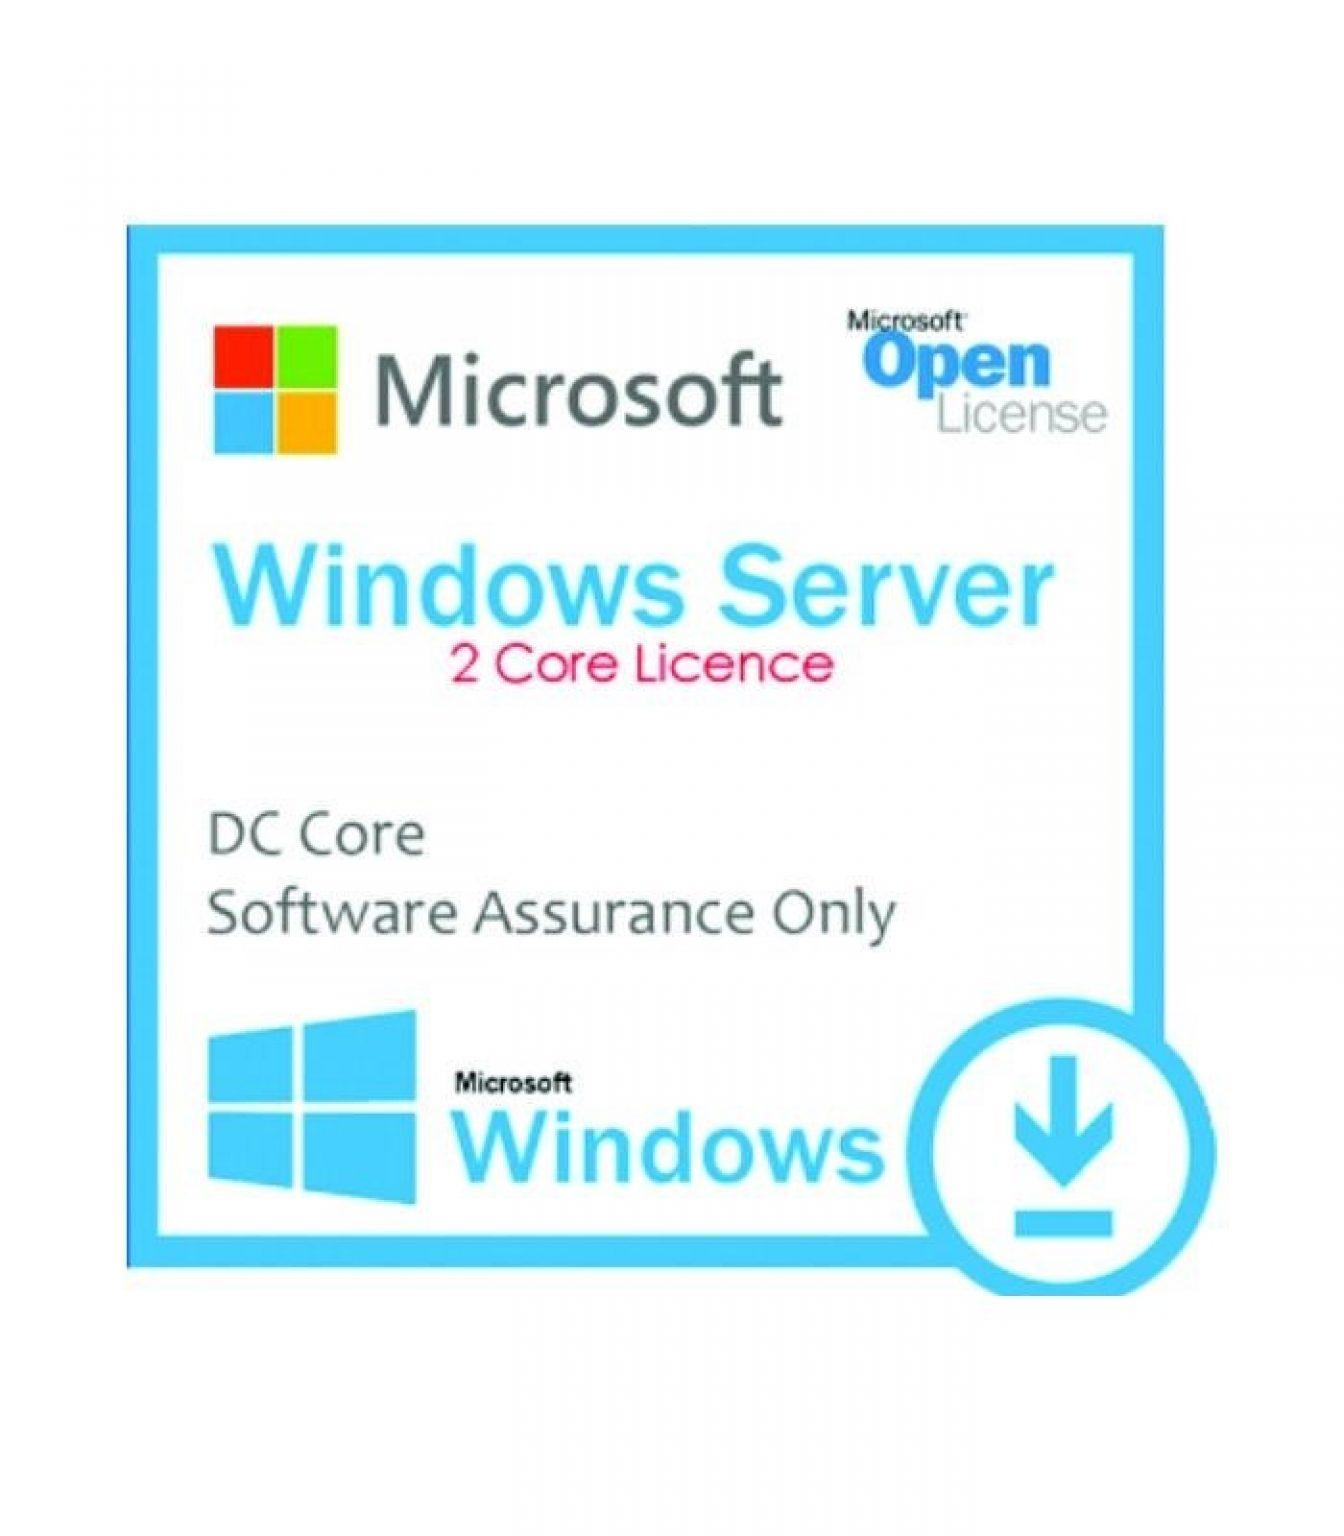 MICROSOFT - [Windows Server DC Core] WinSvrDCCore LicSAPk OLP 2Lic NL Gov CoreLic Qlfd [Pemerintah]